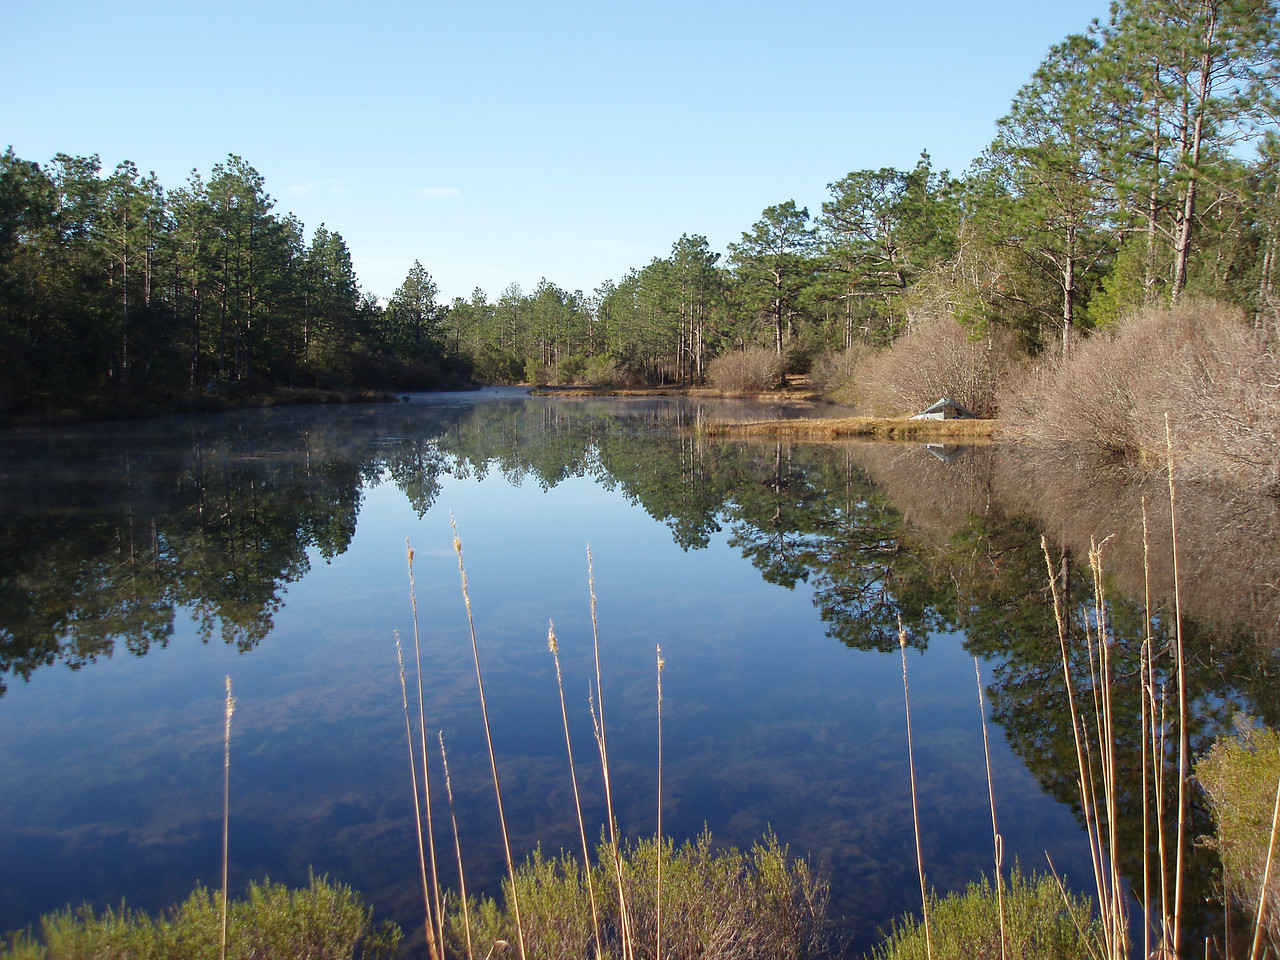 Camping at JR Walton Pond<br /> PHOTO CREDIT: Robert Coveney / Florida Trail Association